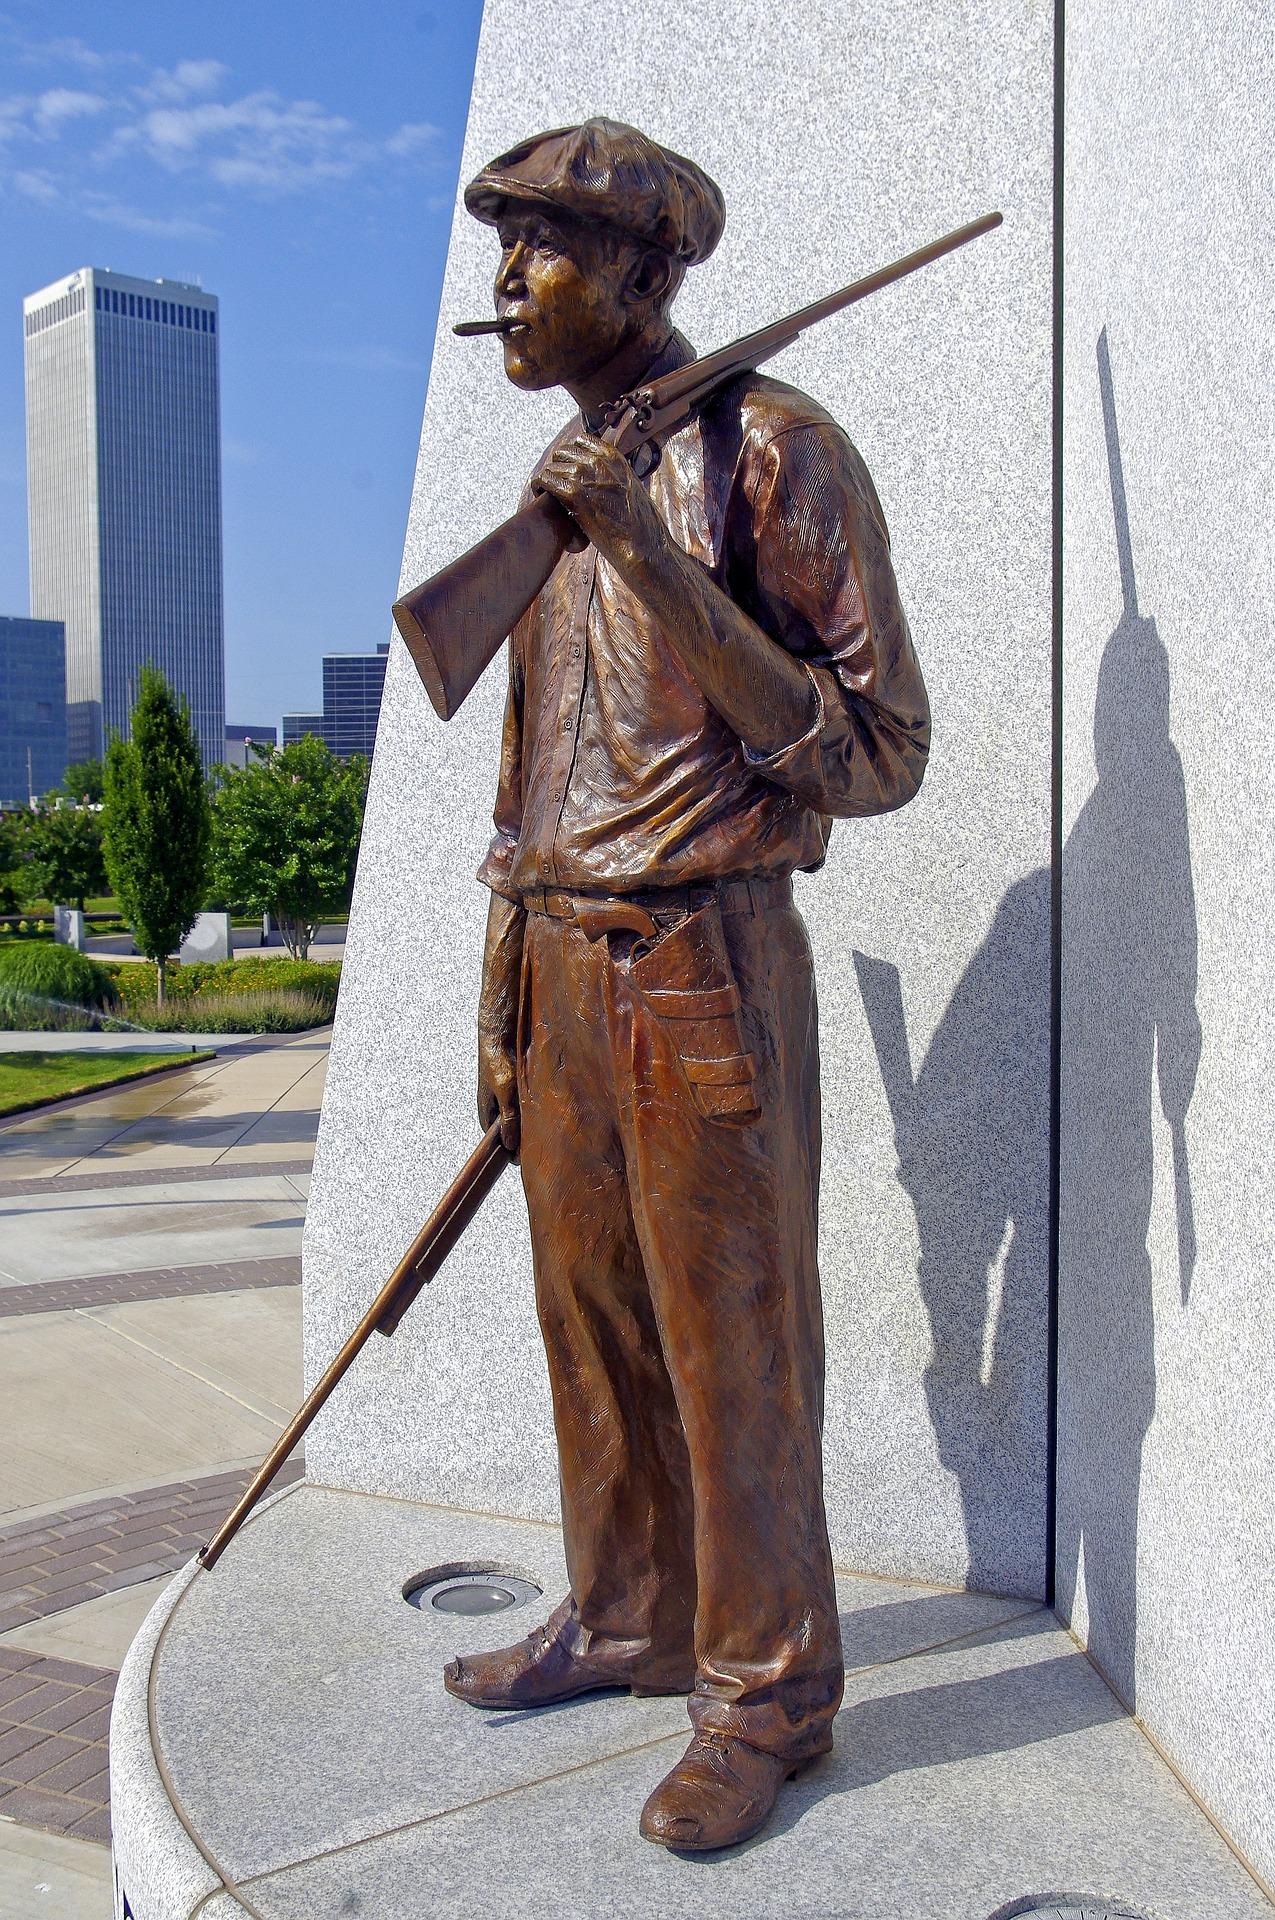 hostility-sculpture-in-tulsa-3910356_1920